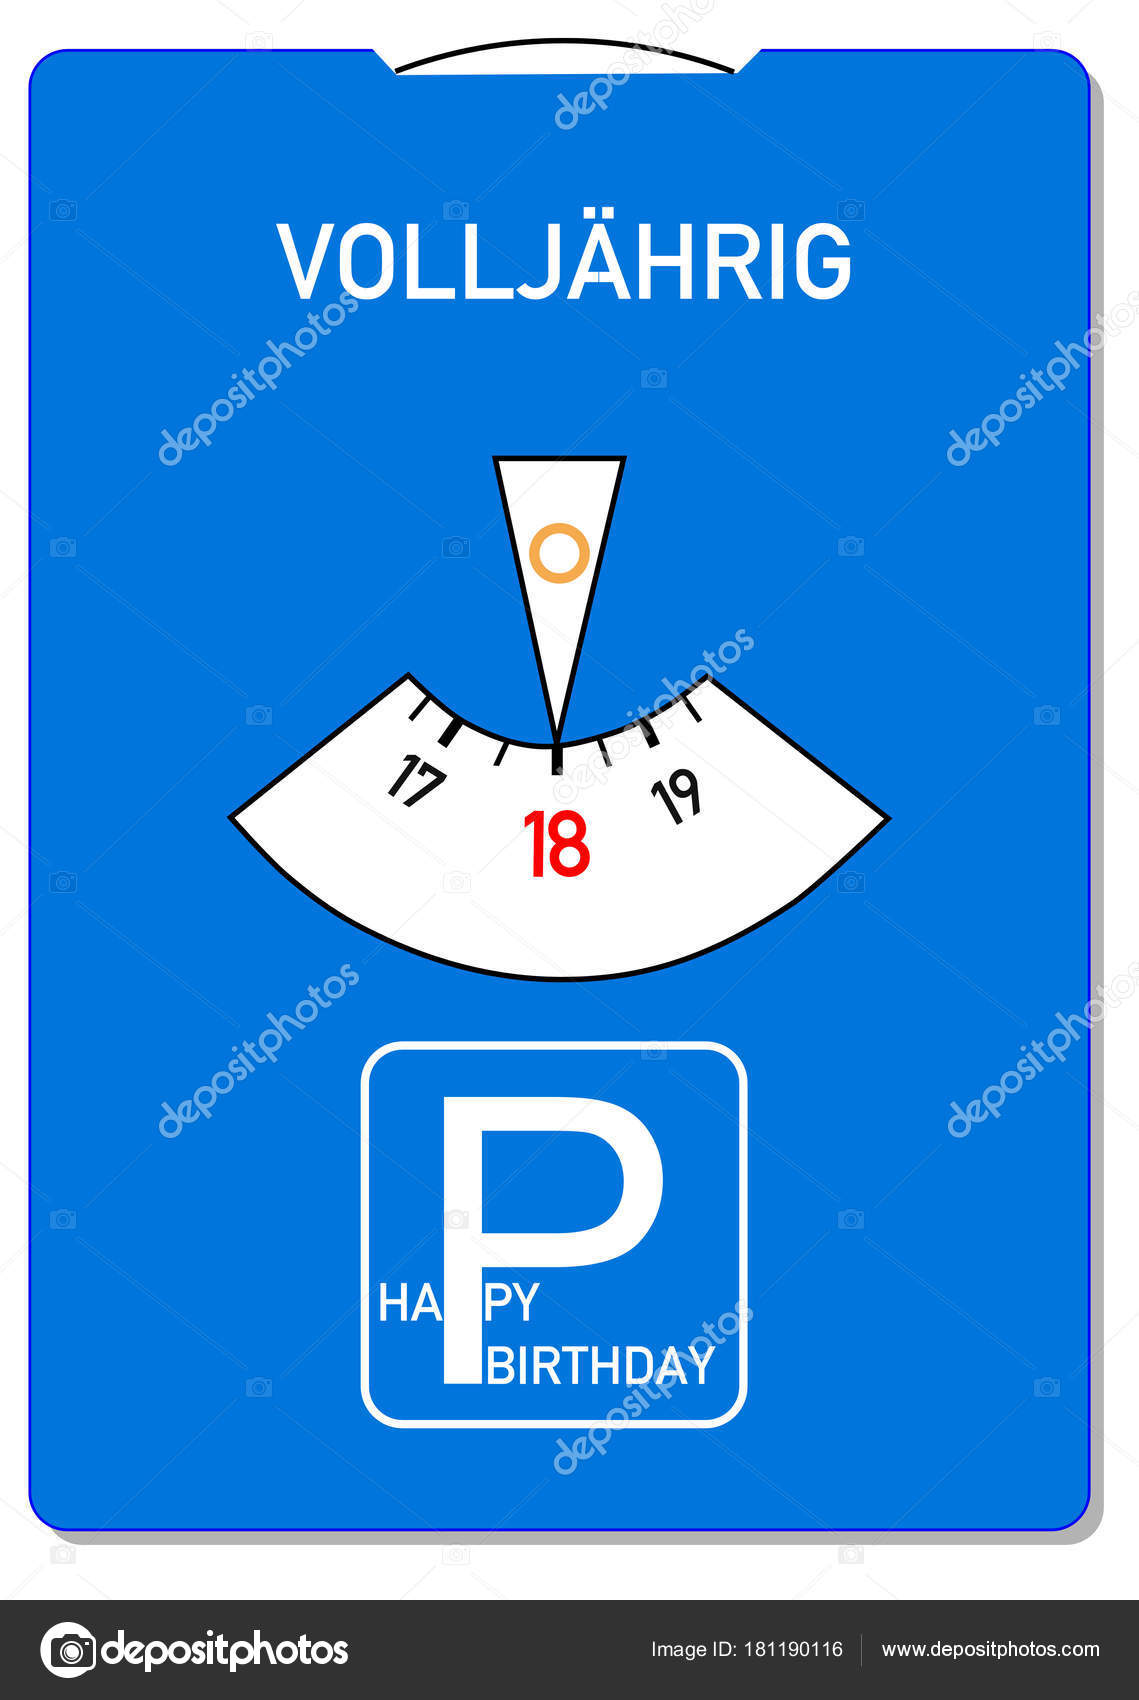 Verjaardagskaart Voor 18e Verjaardag Met Het Duitse Woord